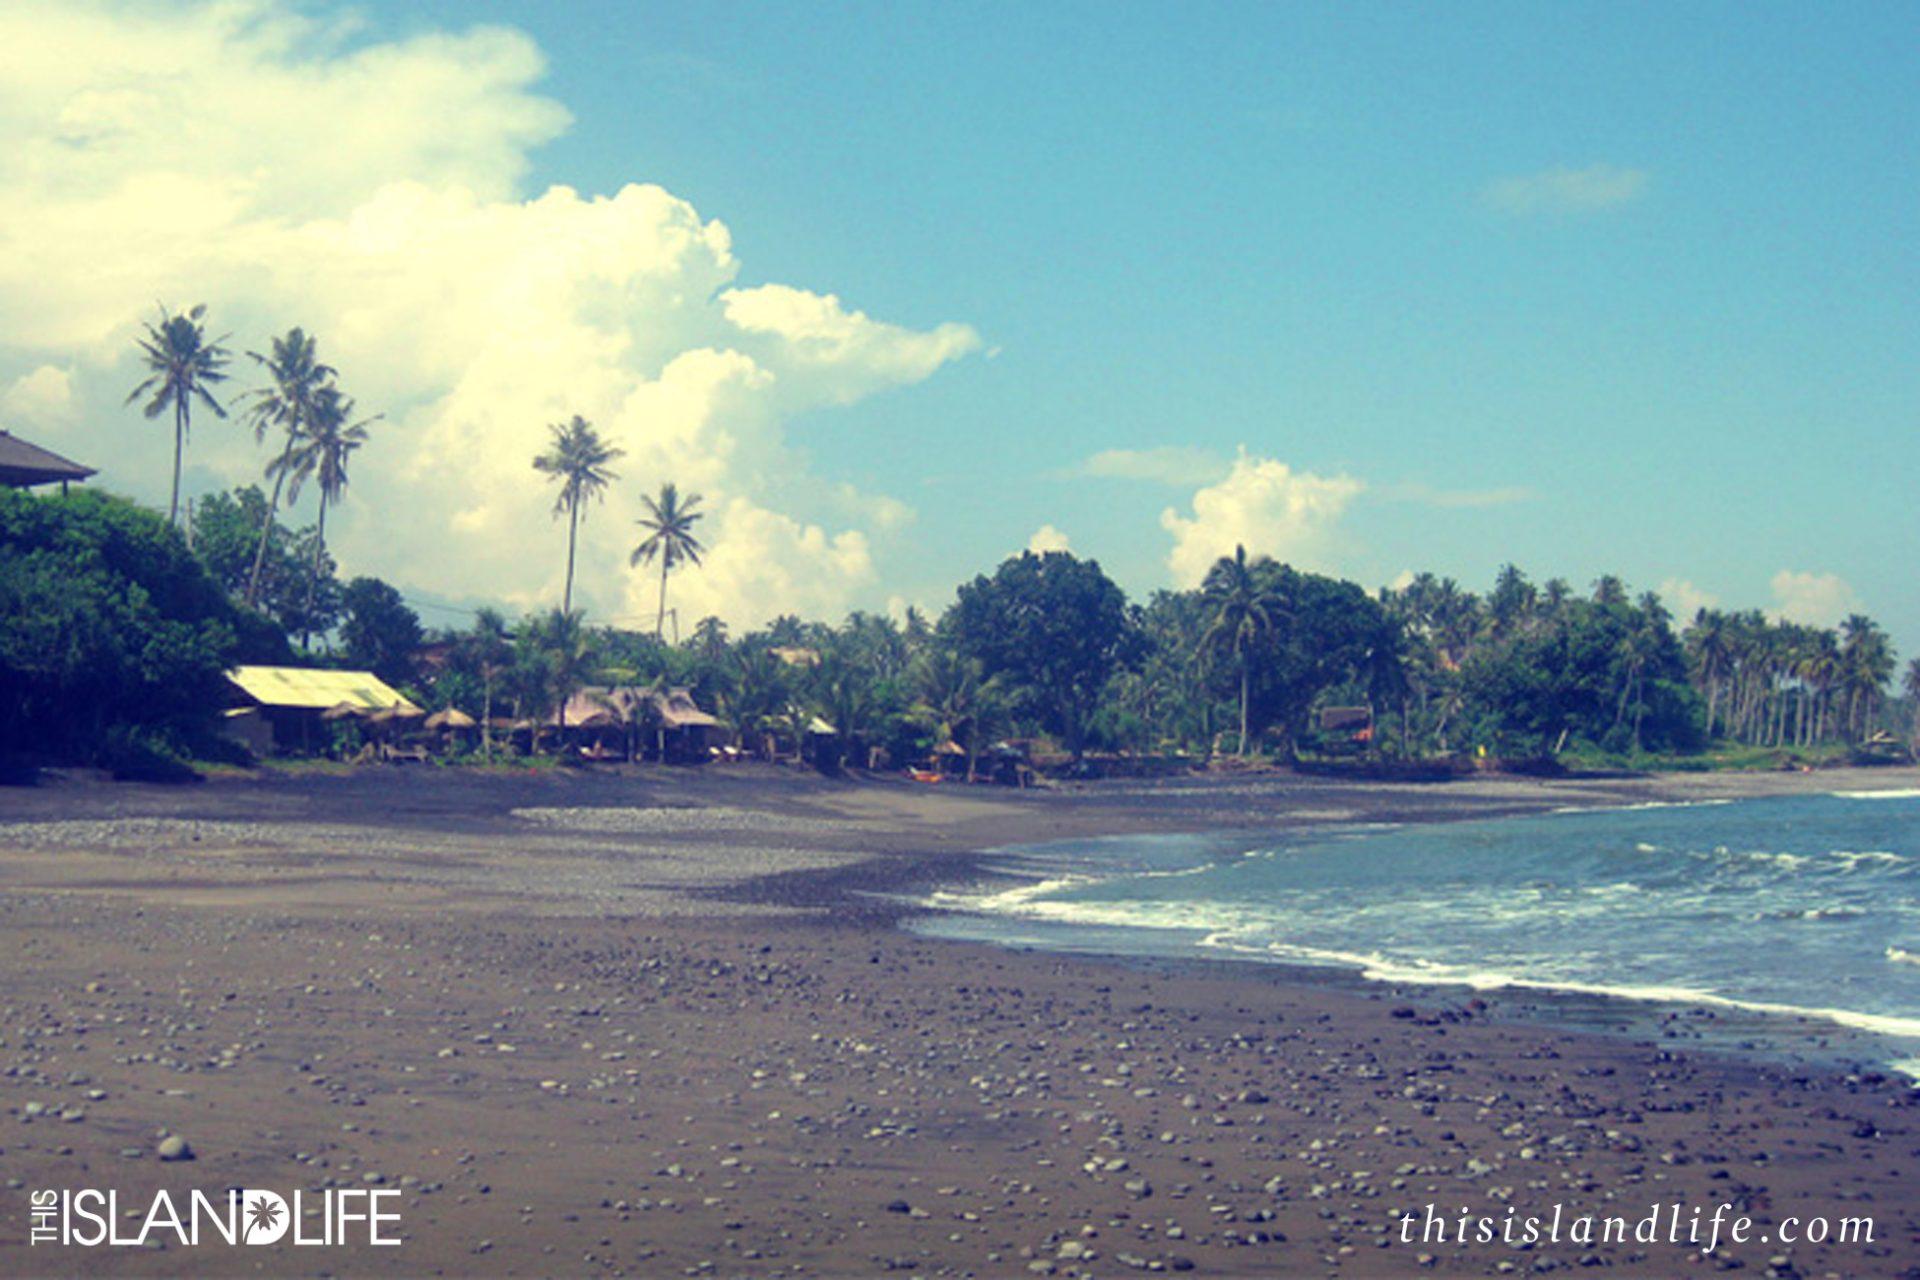 THIS ISLAND LIFE | Balian - Bali, Indonesia